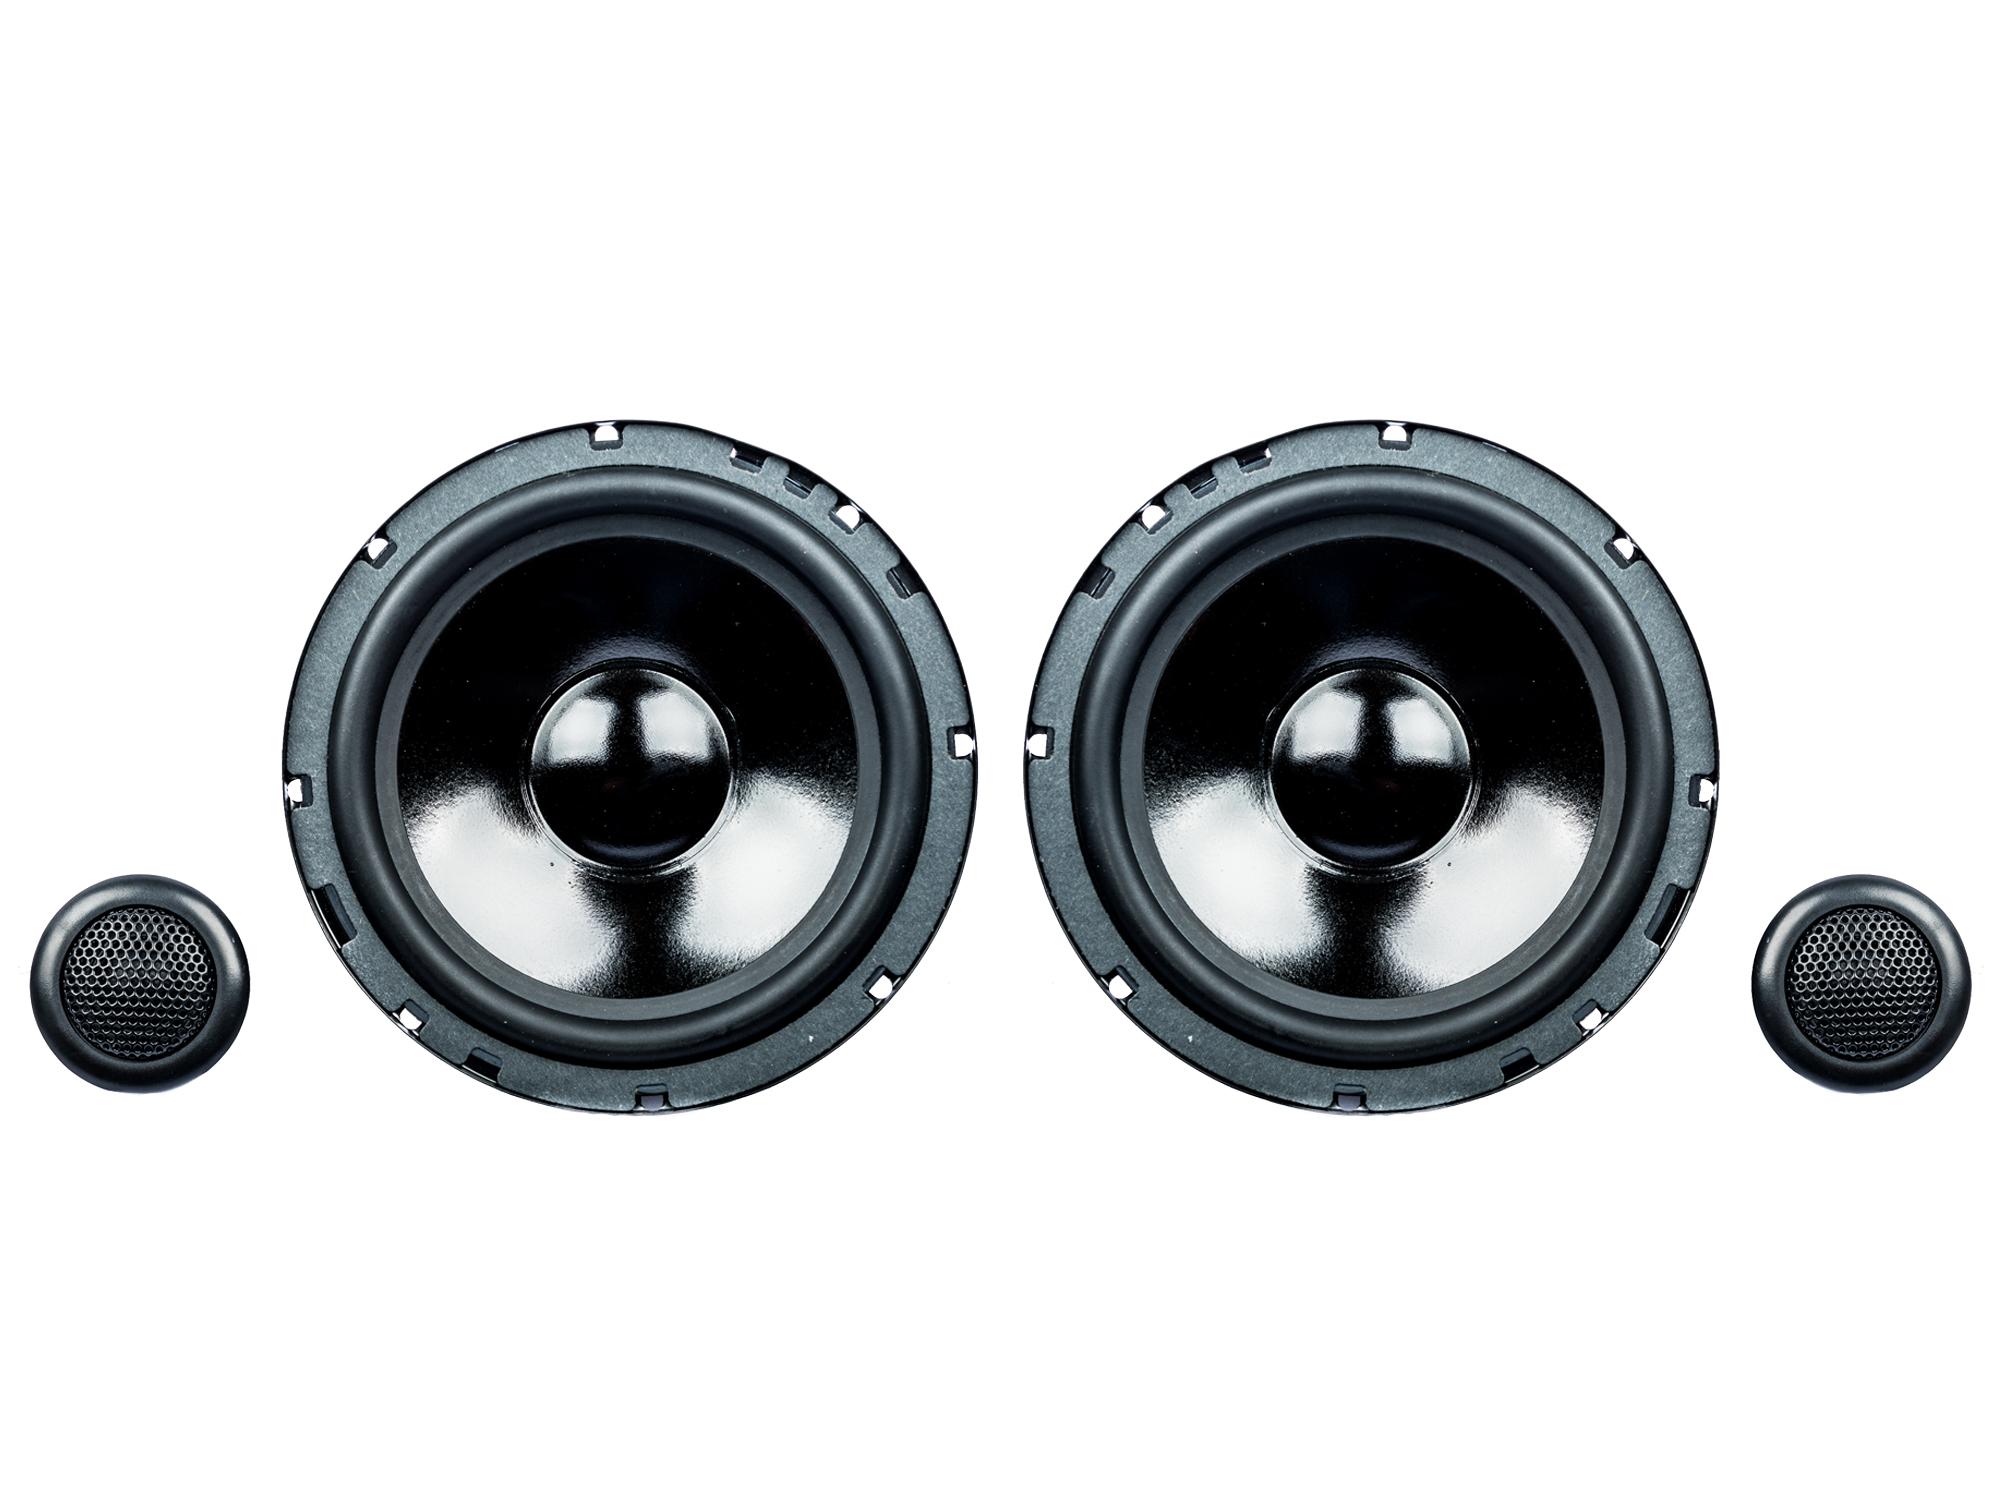 VW Golf 7, VW Polo 9N, VW Up, Lautsprecher, Boxen, Tür vorne, PG Audio Evo II 2.16 – Bild 2